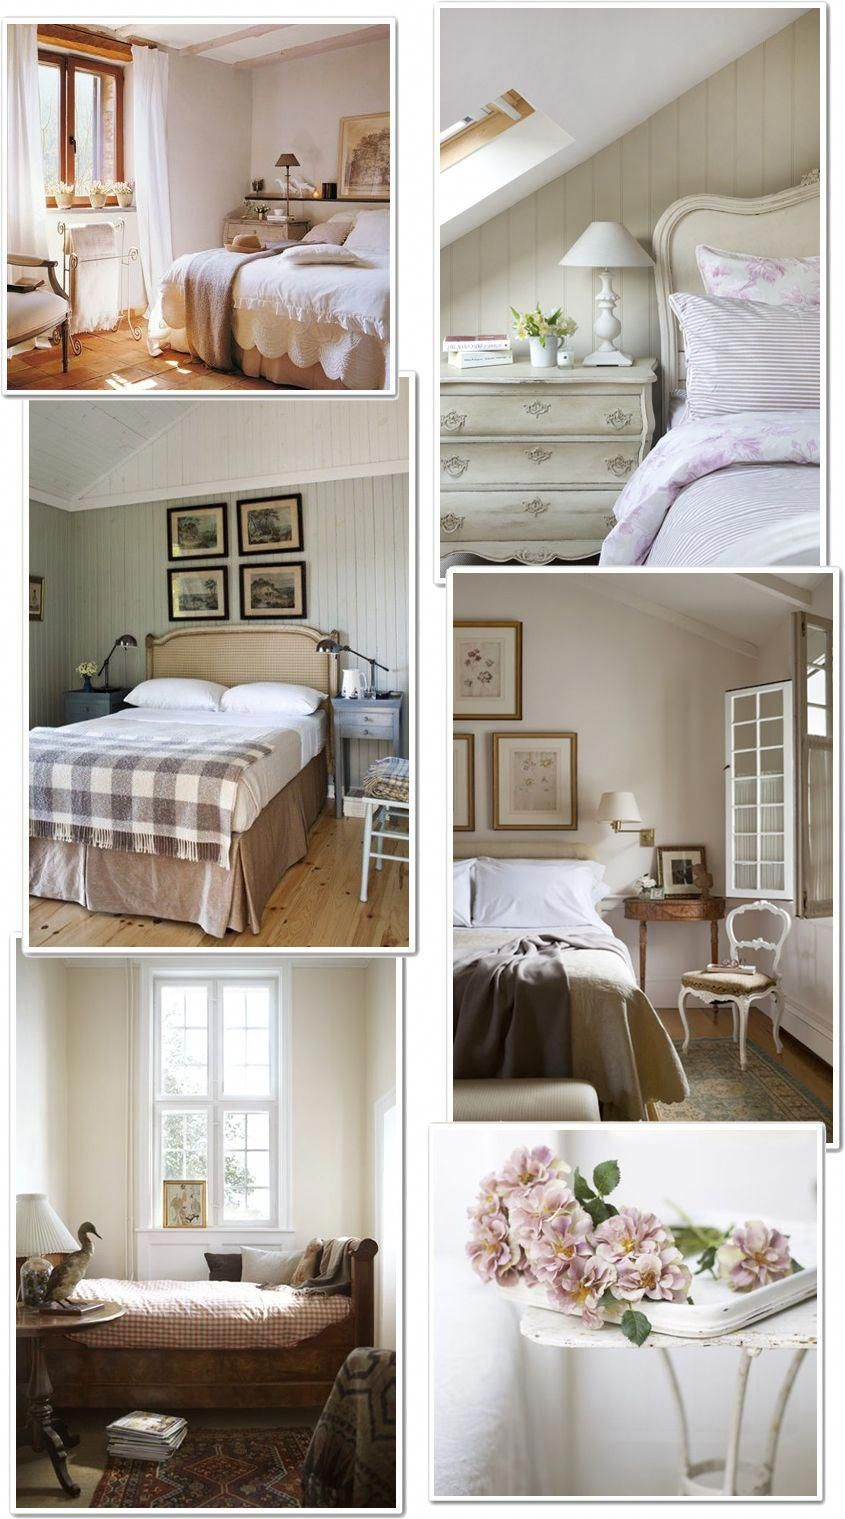 Shabby Chic Interiors: Camera Matrimoniale #Shabbychicbedrooms ...